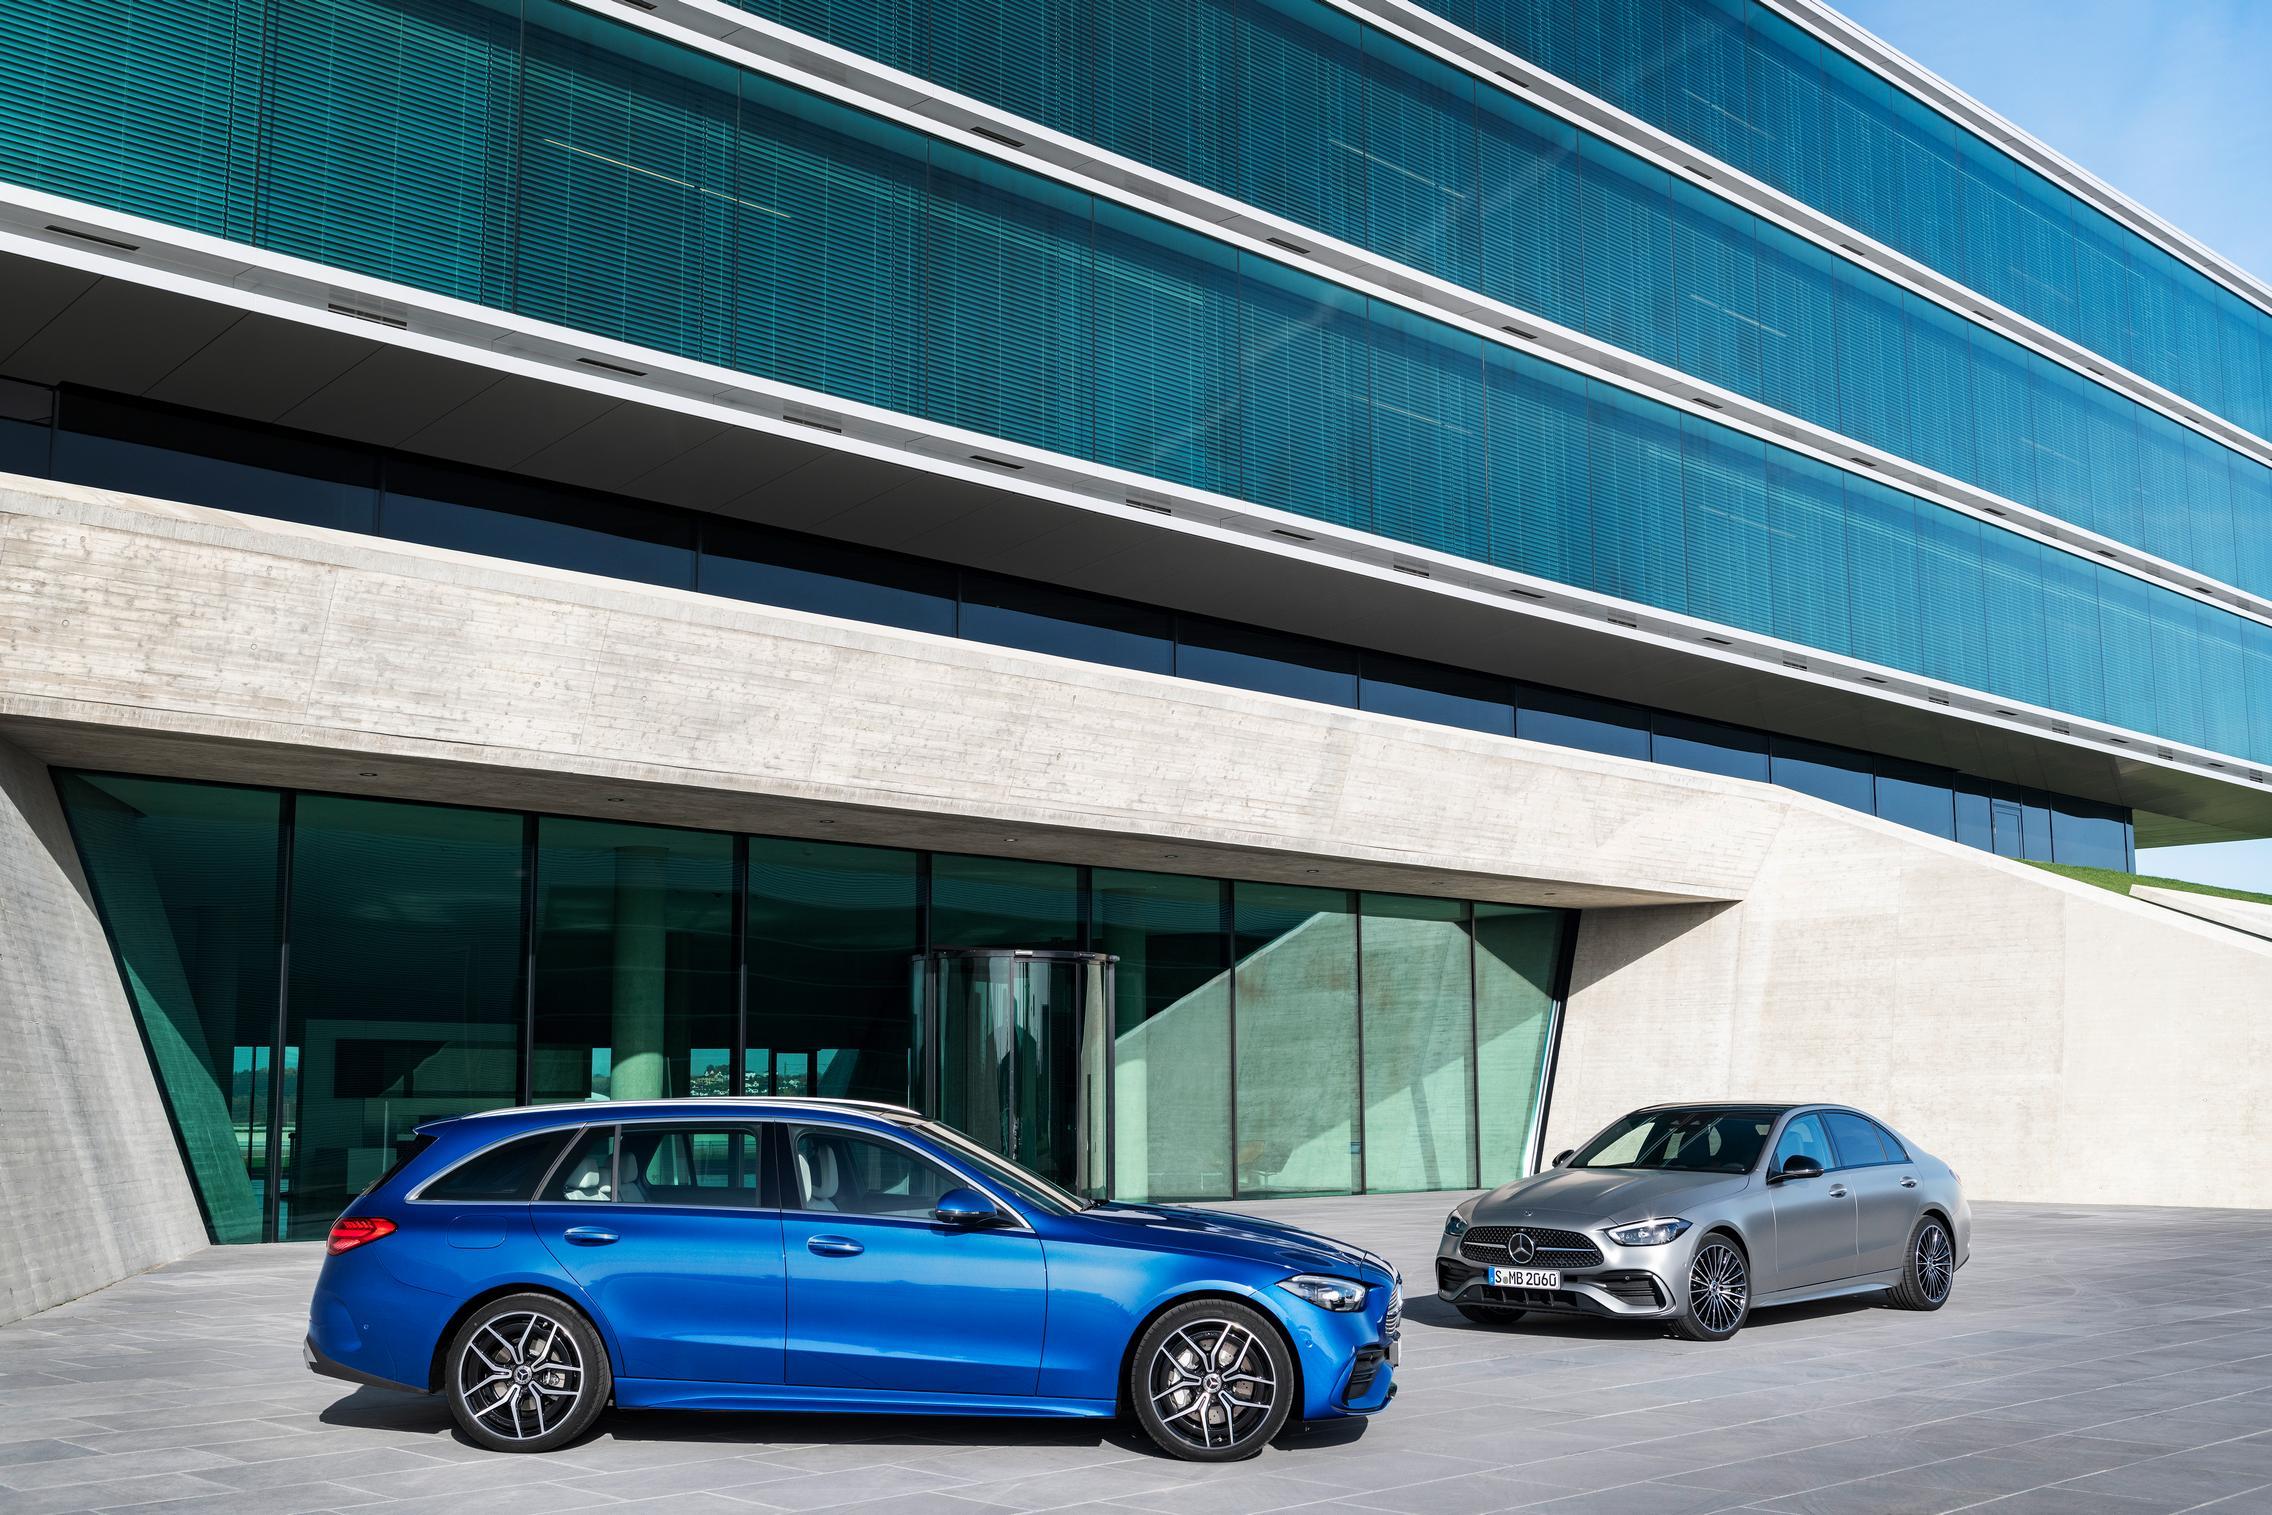 New-W206-C-Class-sedan-estate